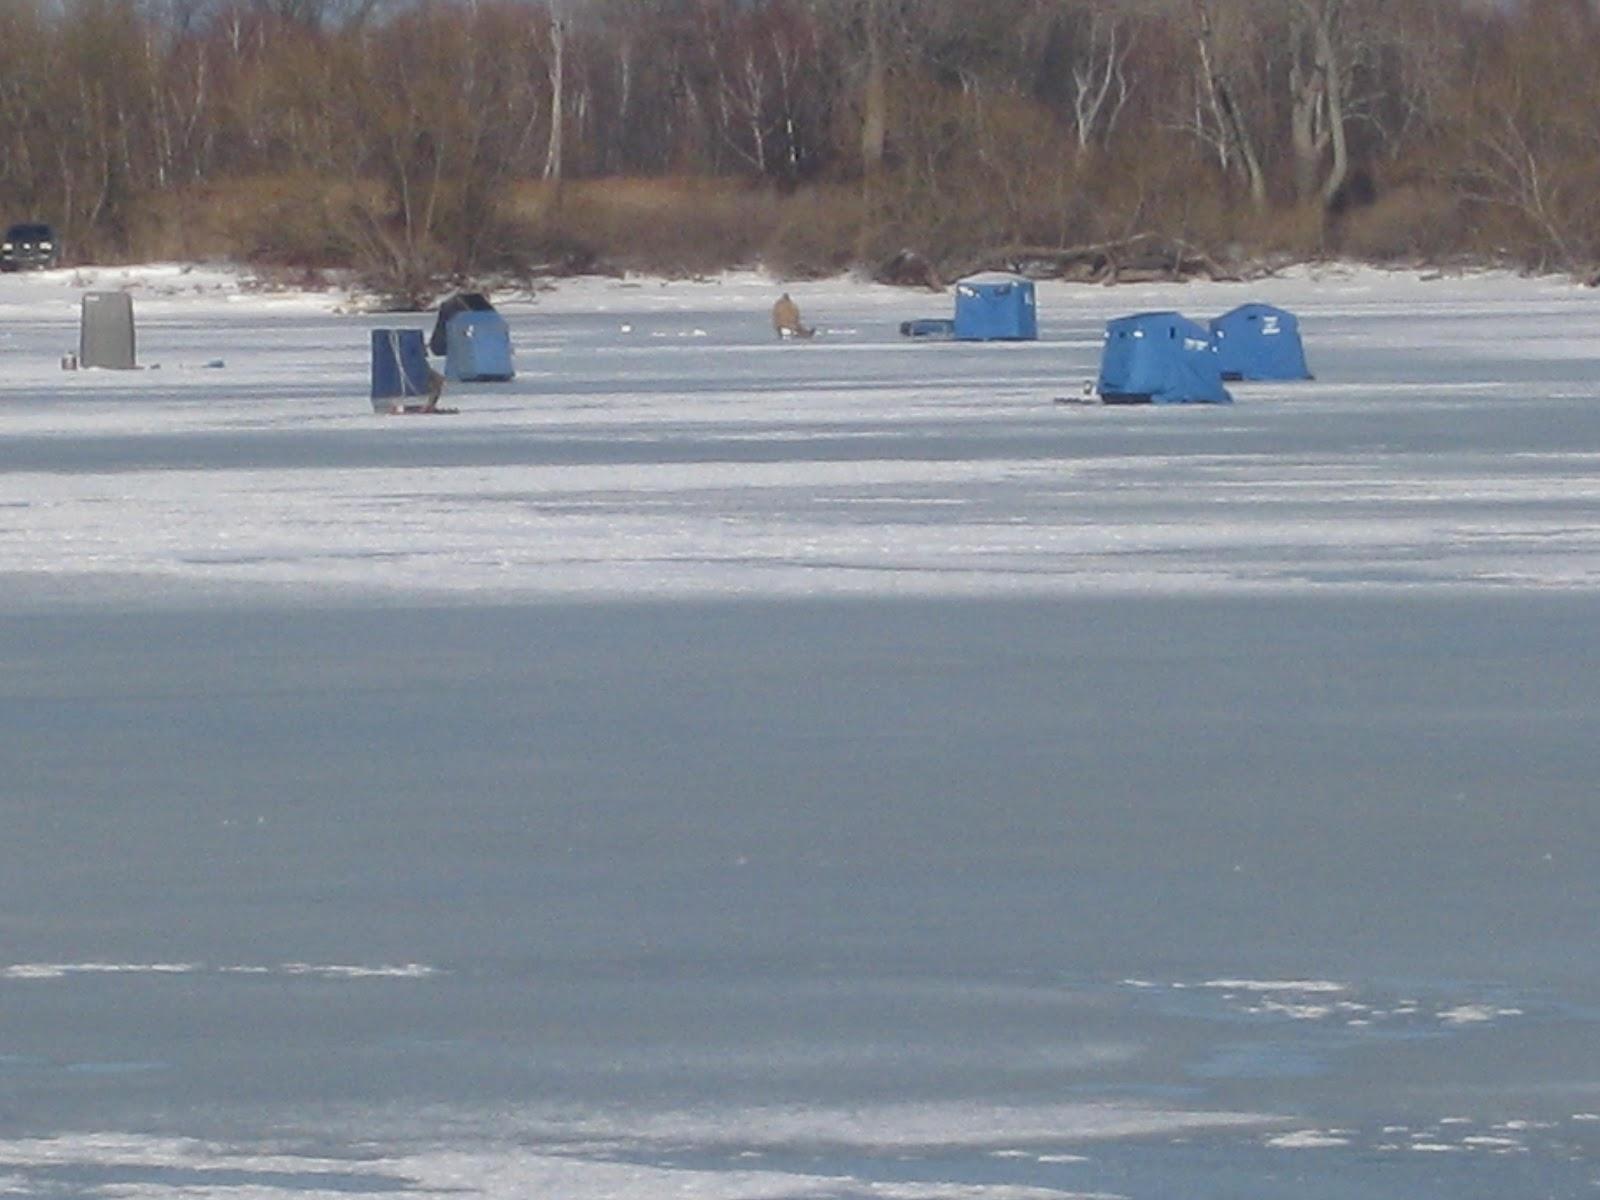 Lake erie fishing blog ice is good for fishing presque for Lake erie fishing